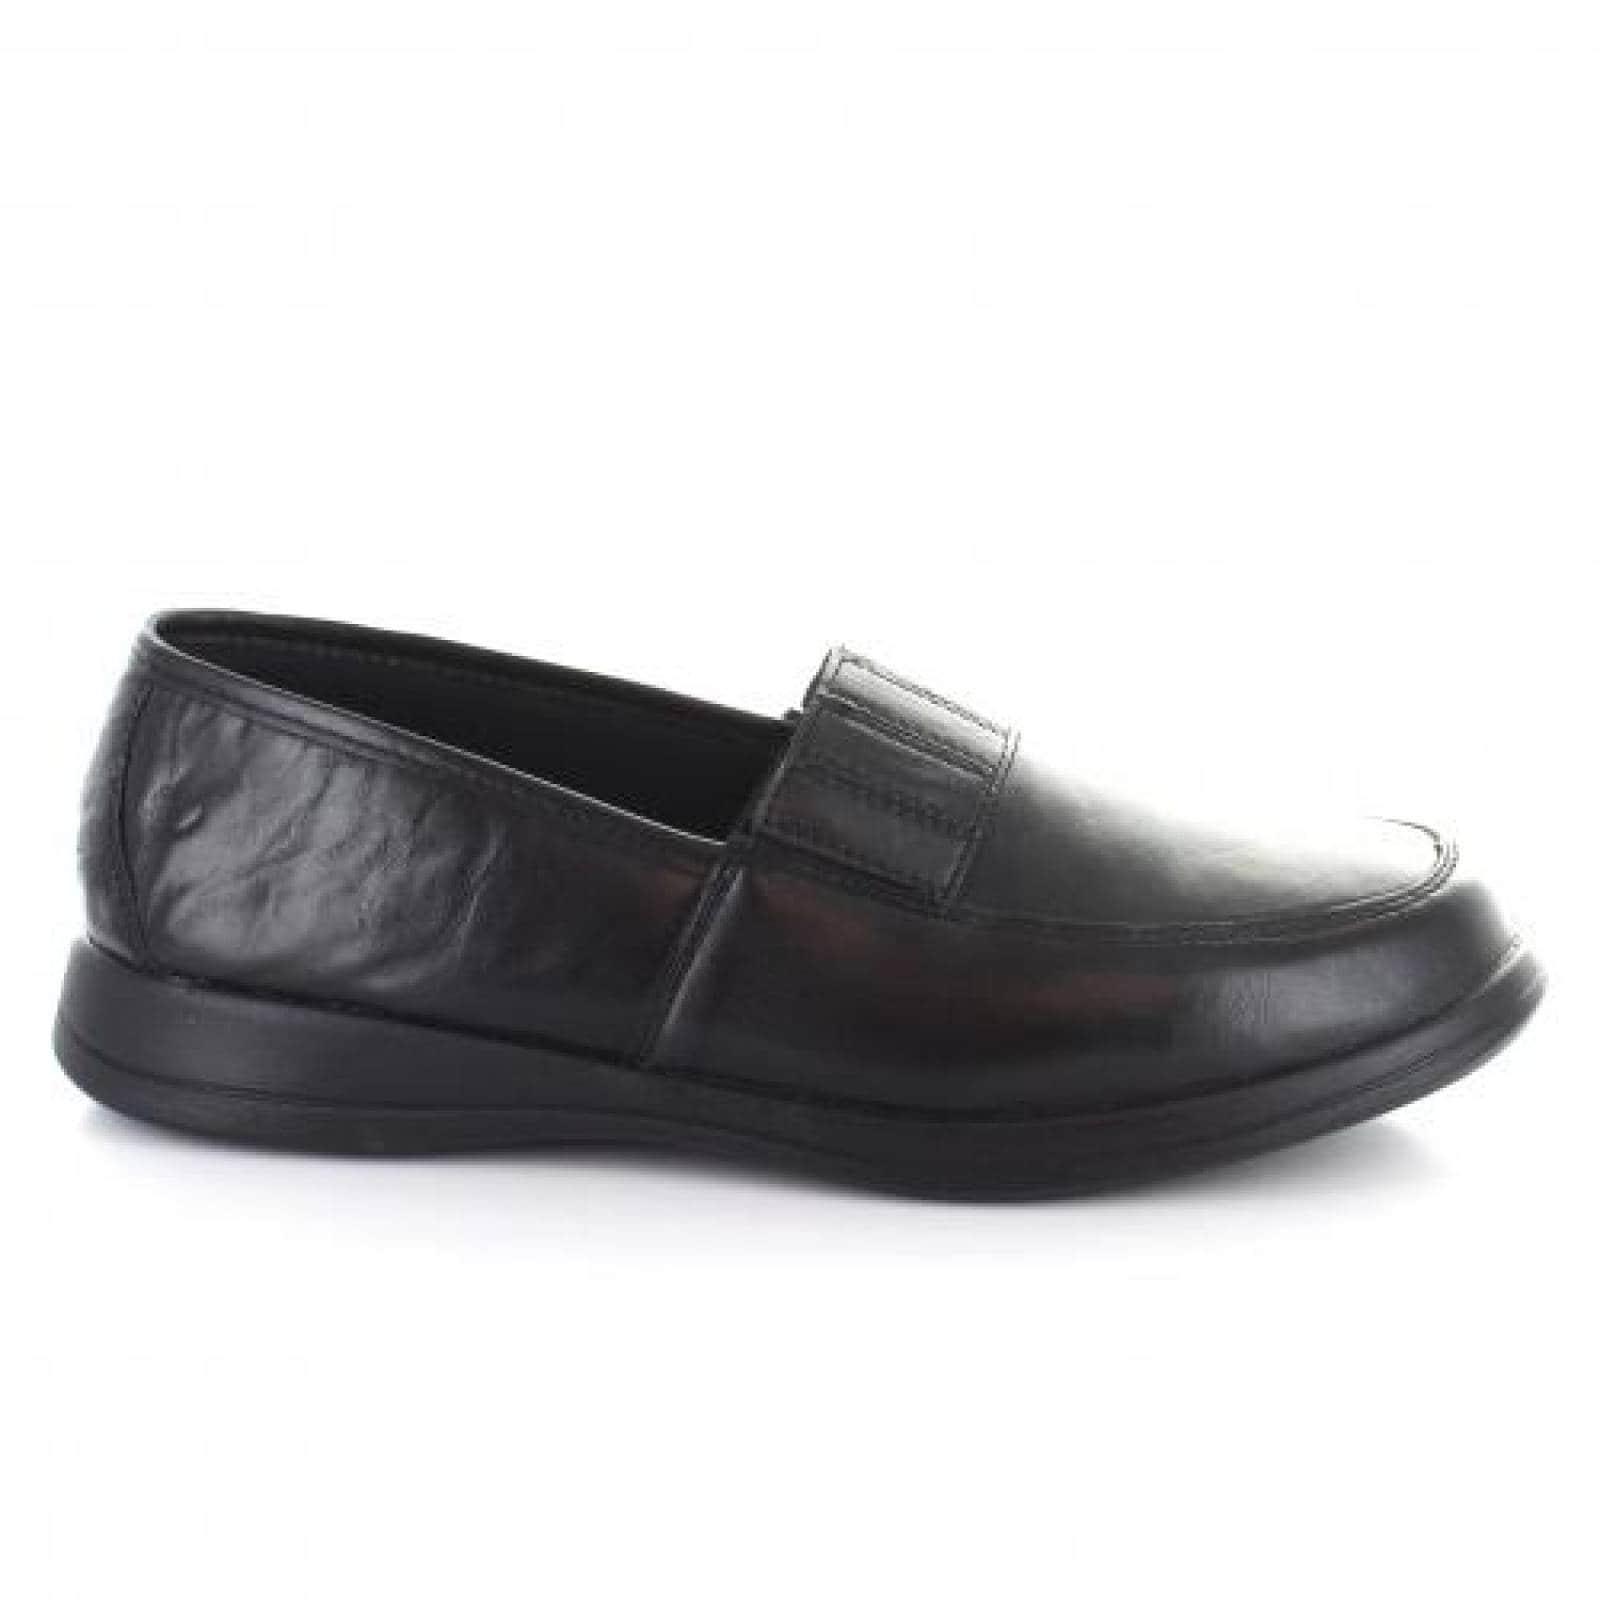 Mocasin para Mujer Comfortberry 2532 049212 Color Negro